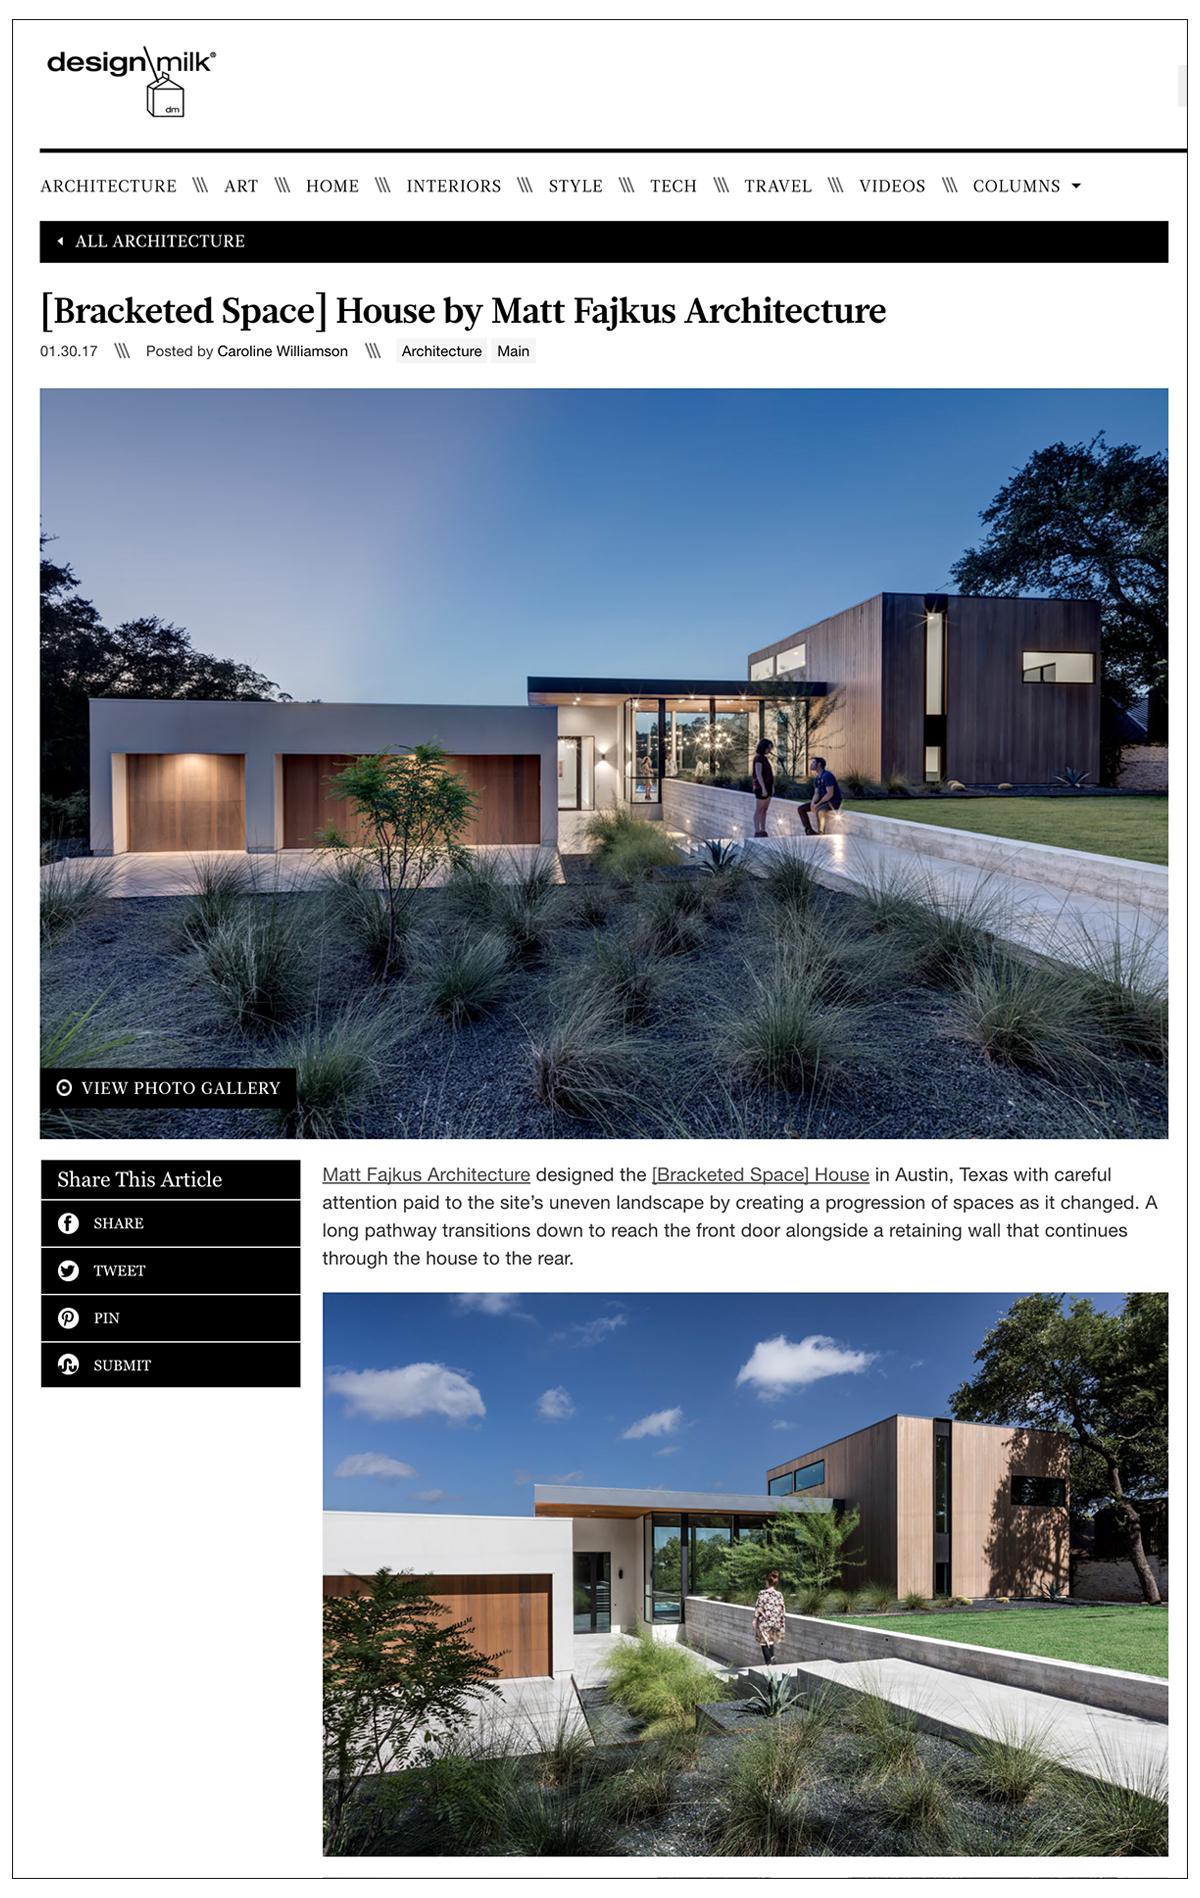 2017-01 Design Milk_Bracketed Space House_with border.jpg